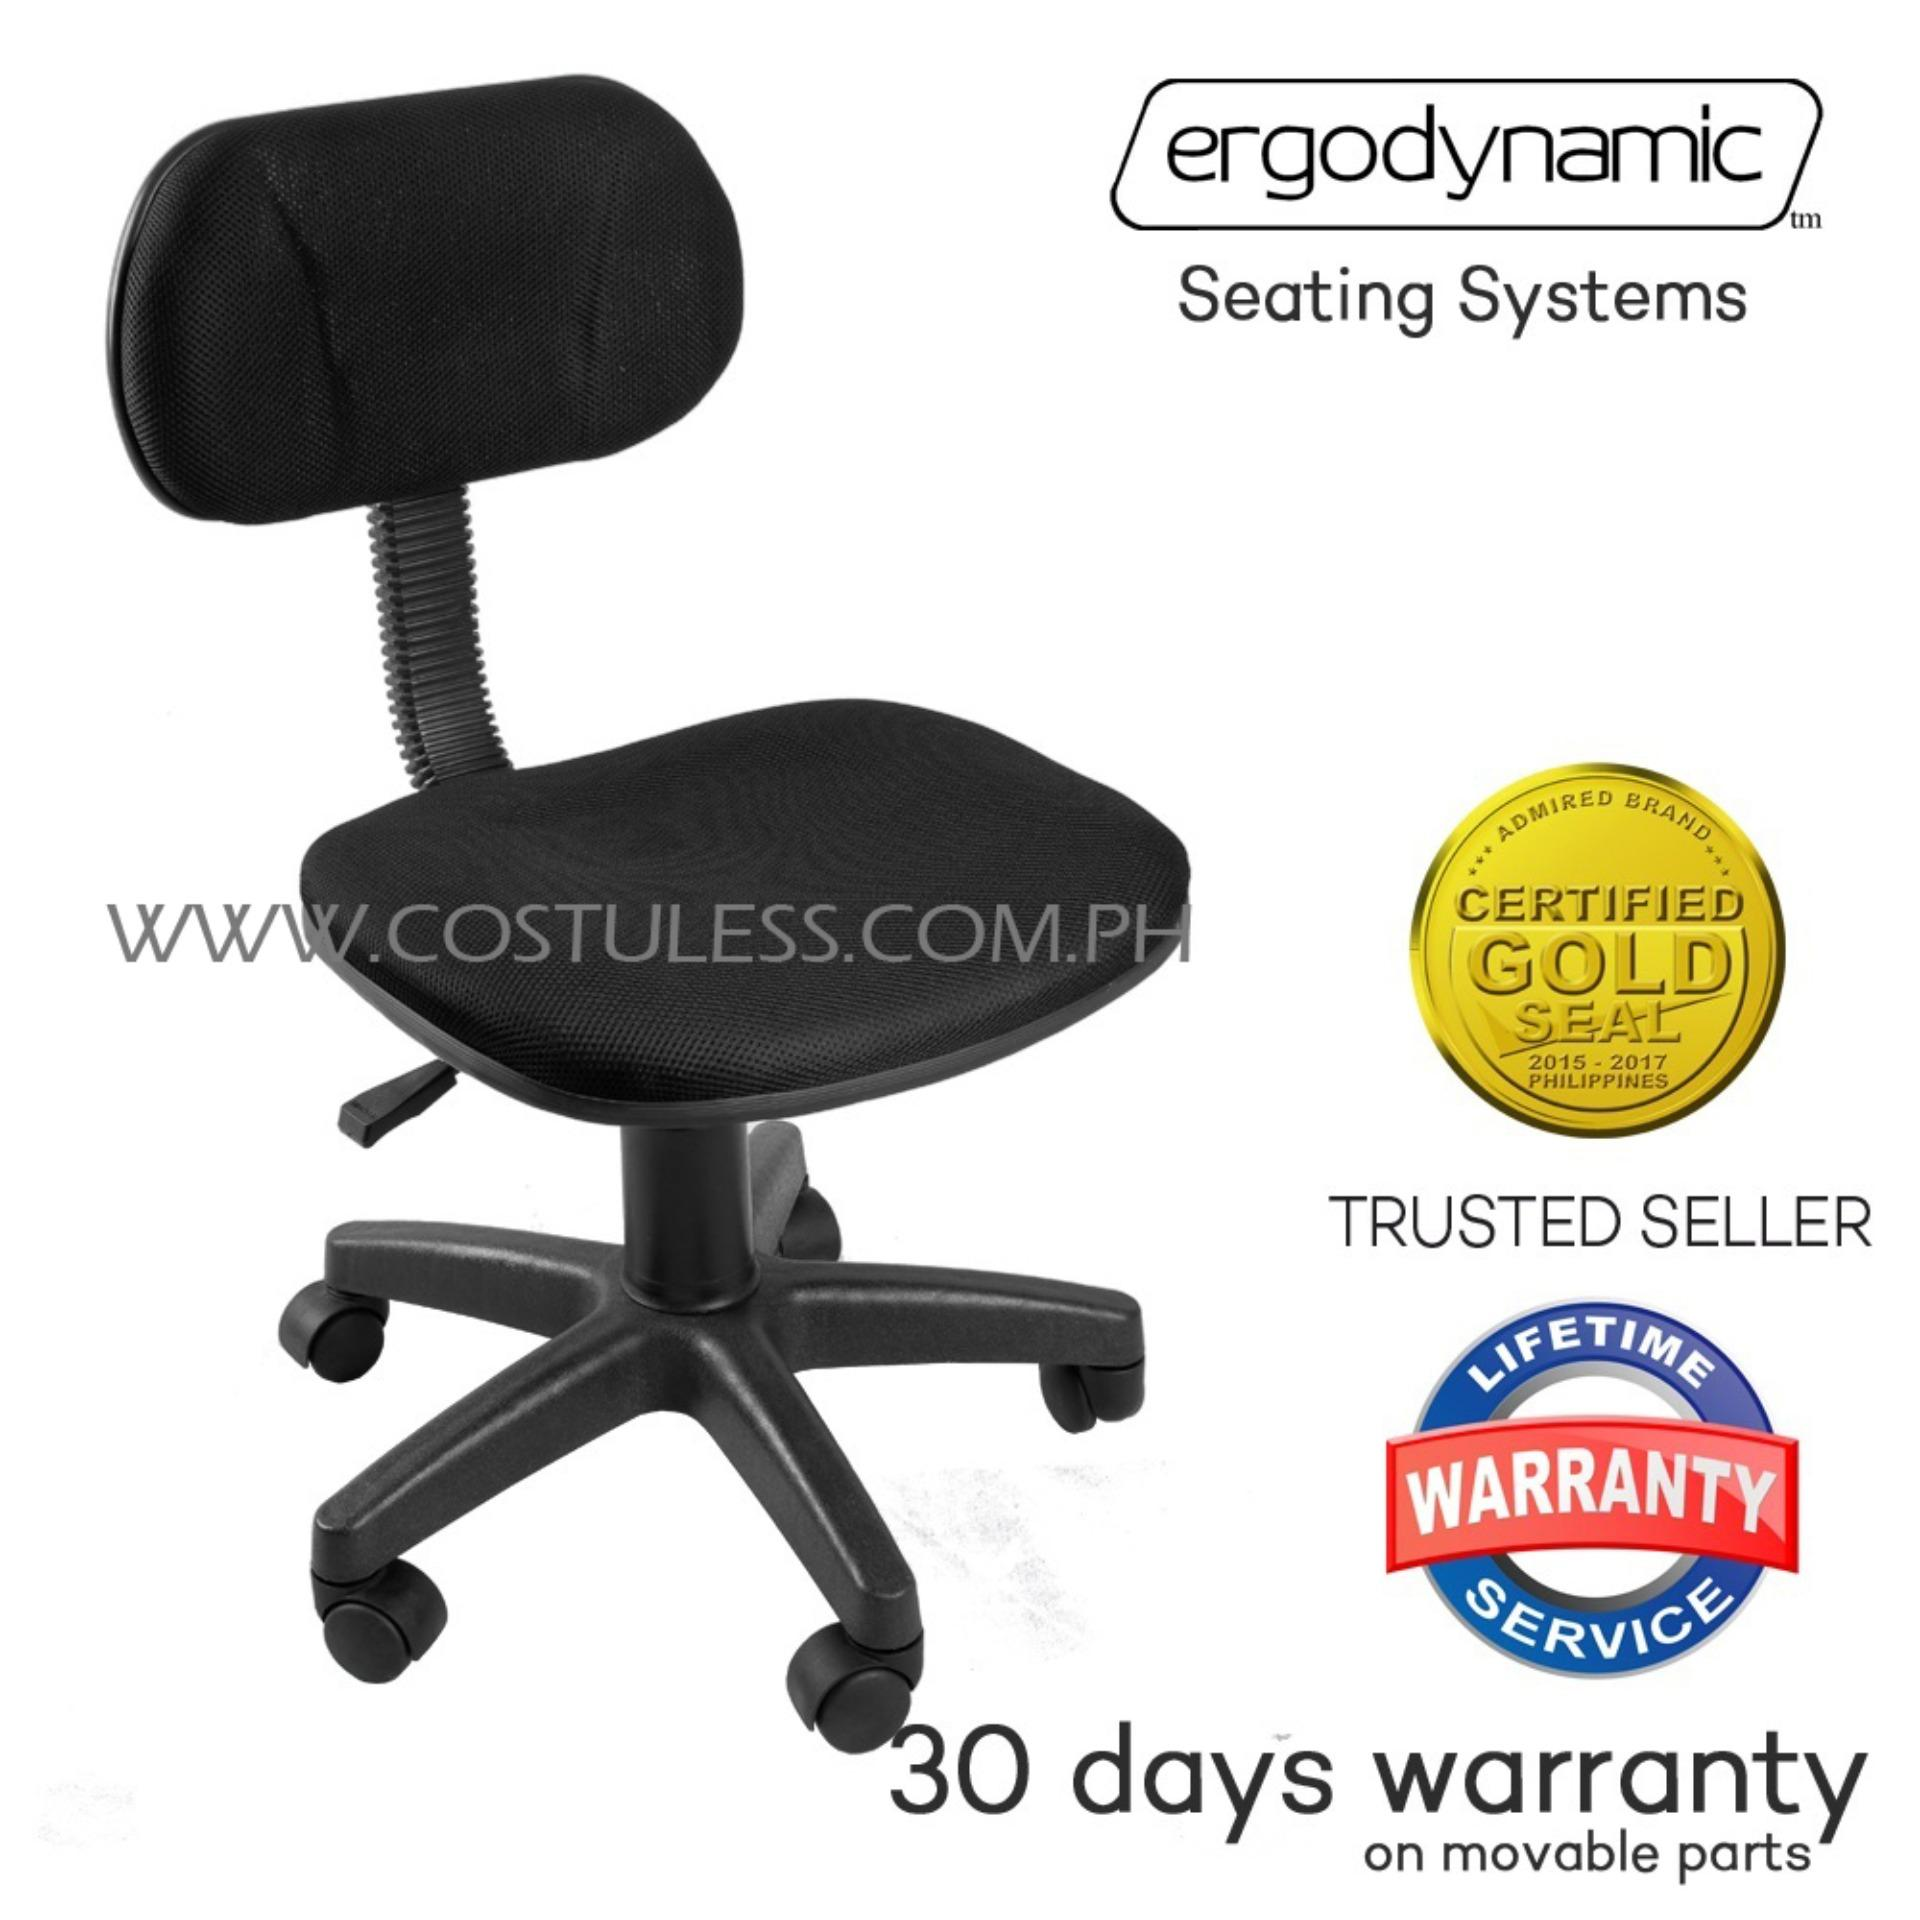 Remarkable Ergodynamic Oc 121P Office Chair Furniture Computer Chair Staff Chair Black Download Free Architecture Designs Xerocsunscenecom